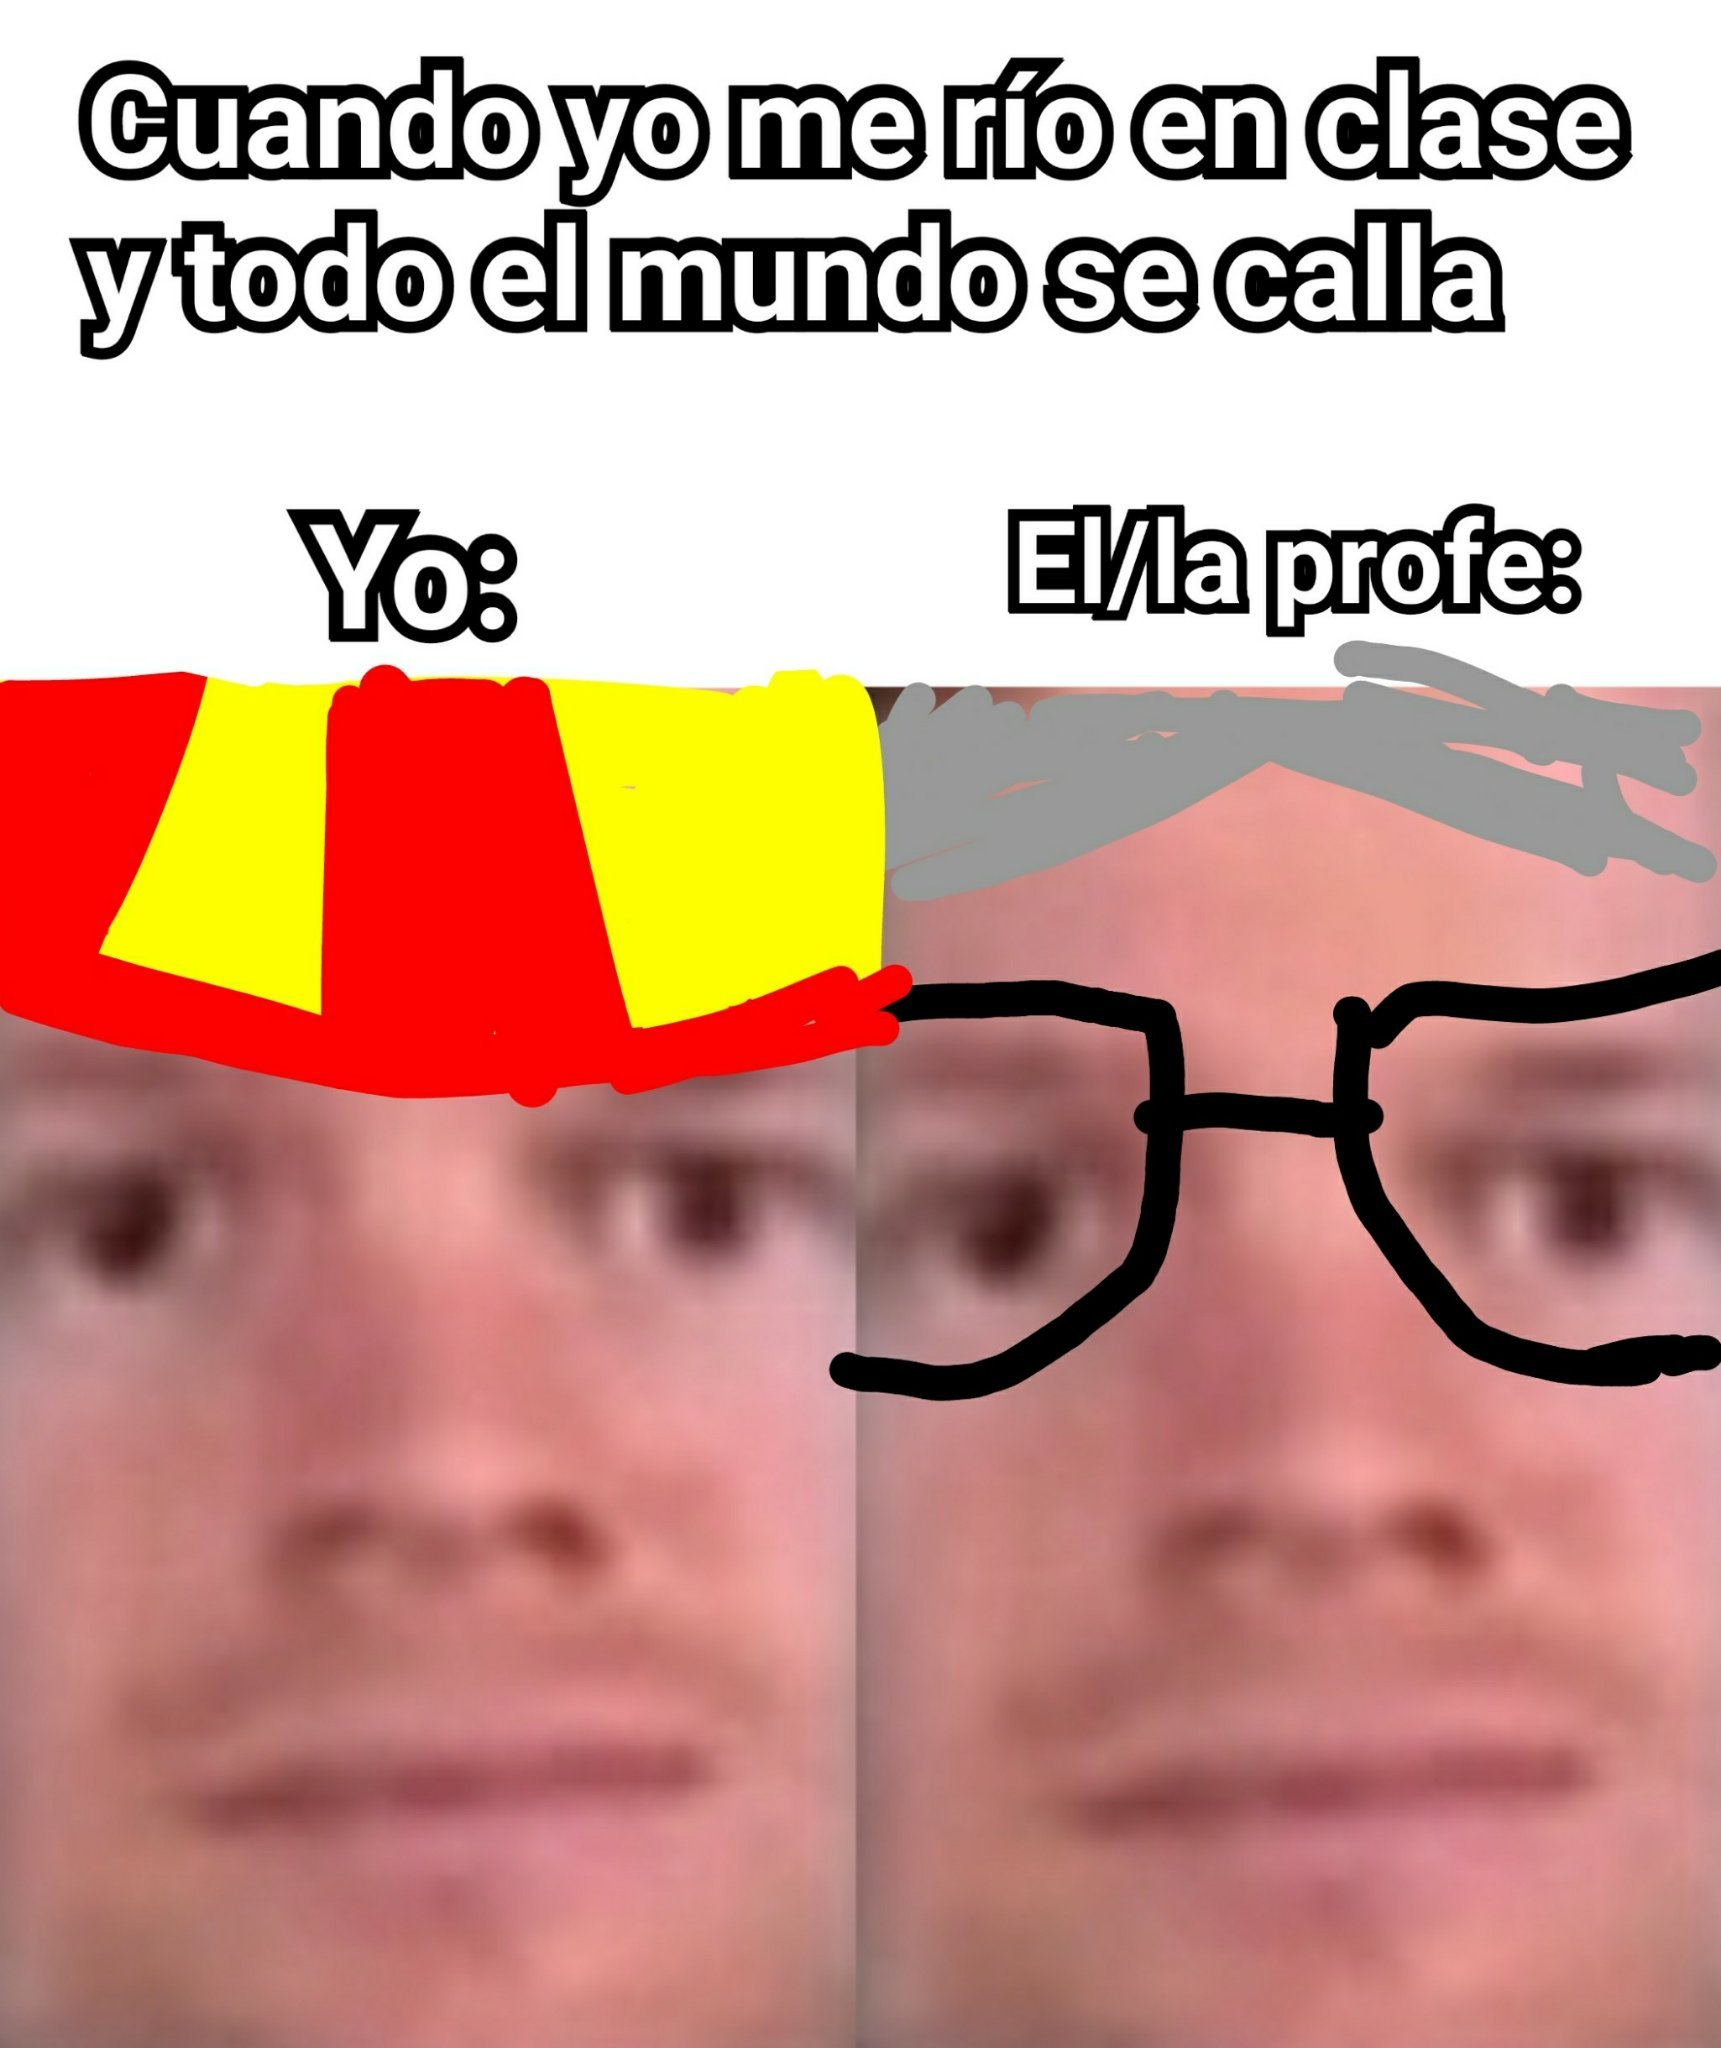 Jaja hola profe que tal - meme